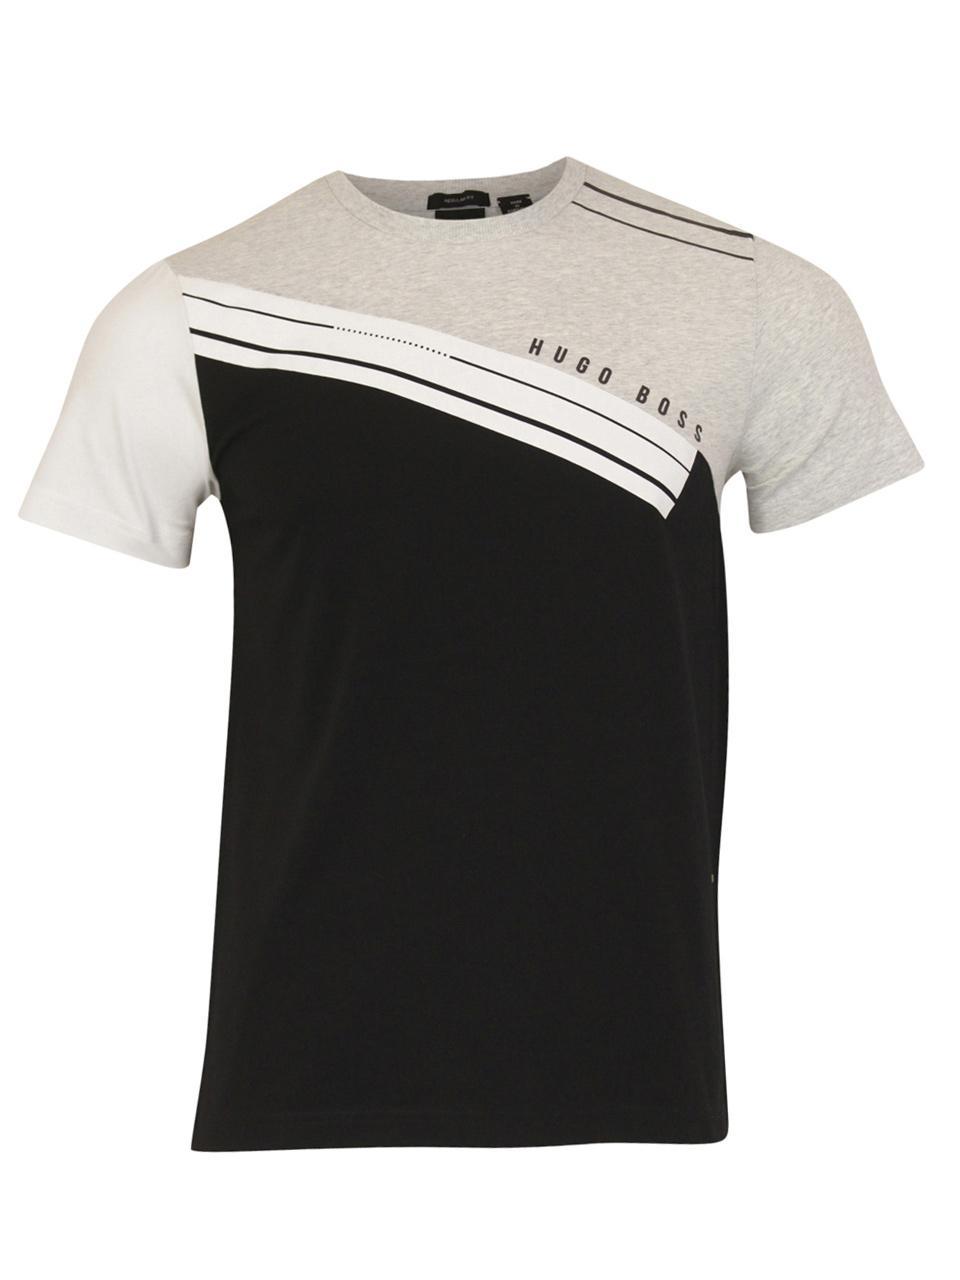 Hugo Boss Mens t-Shirt Tee 1 White 50399291 100